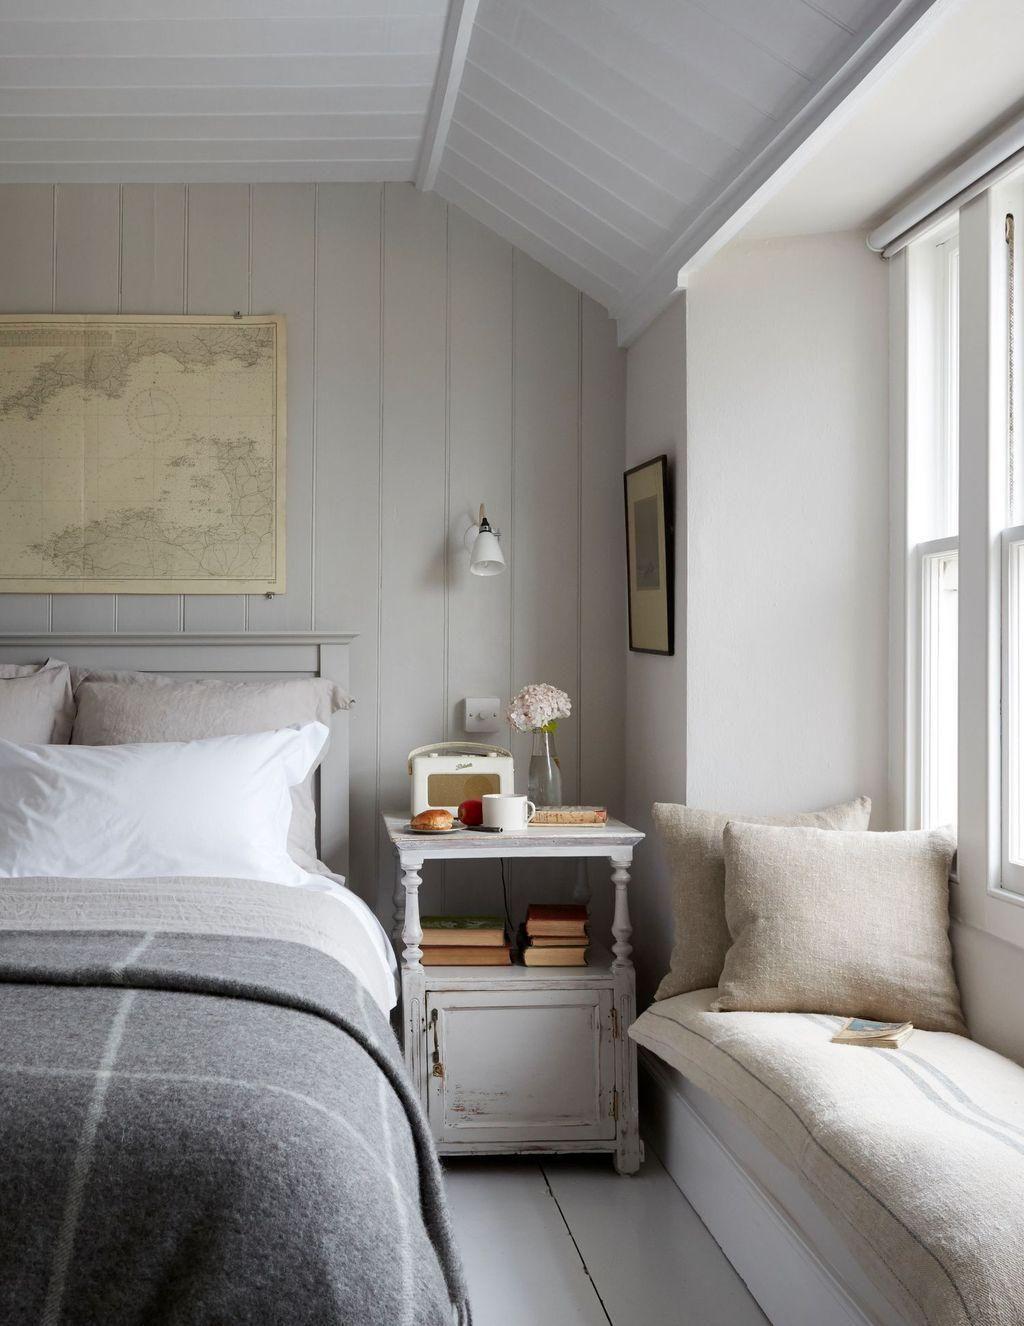 20 Perfect Coastal Bedroom Decorating Ideas To Apply Asap Luxury Cottage Coastal Bedroom Decorating Luxury Bedroom Inspiration